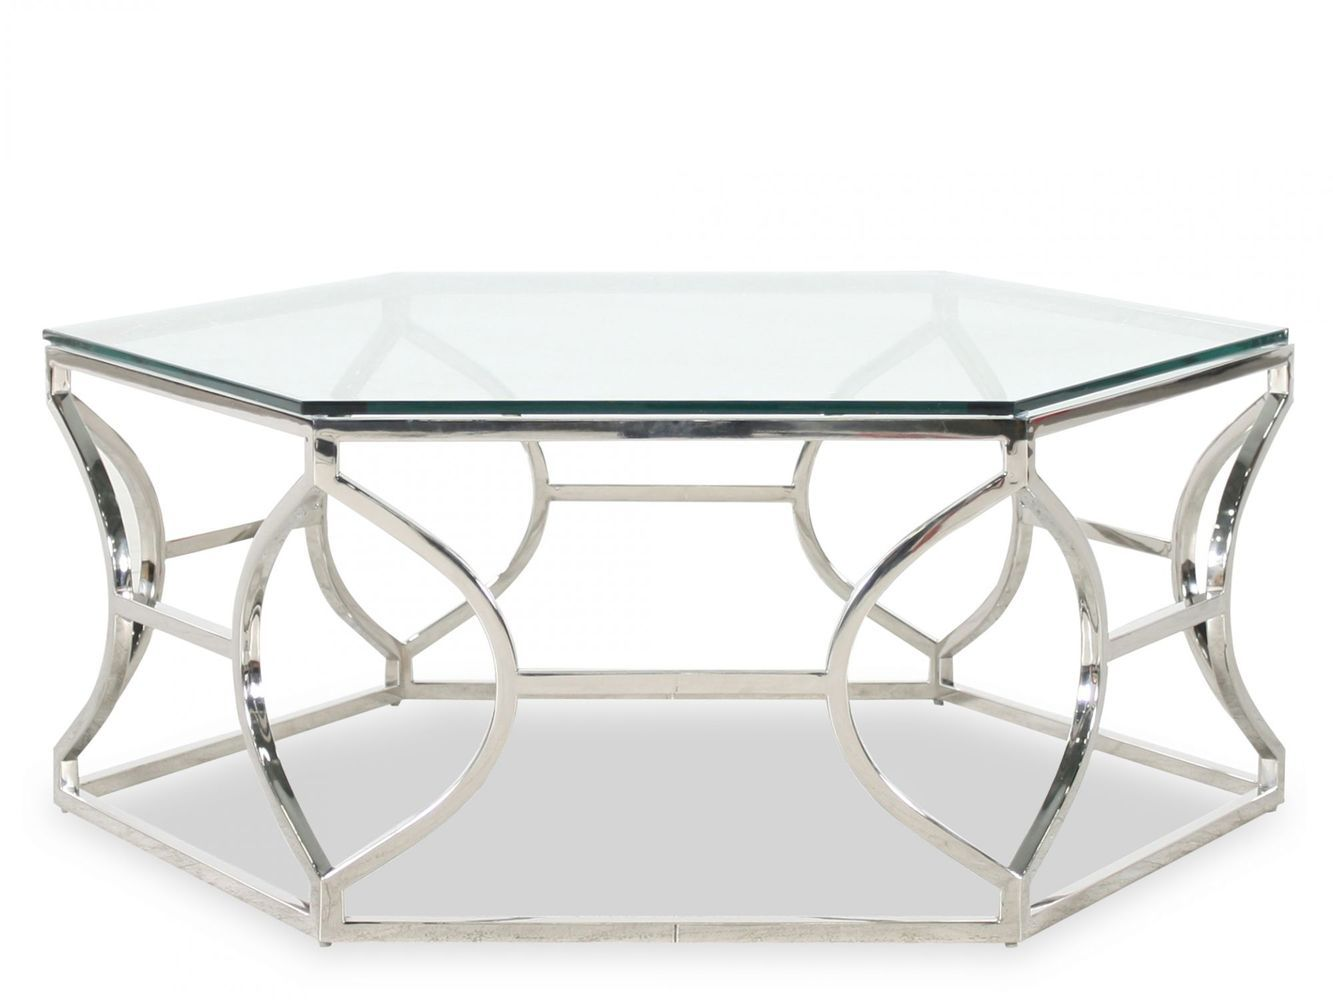 Bernhardt Interiors Argent Metal Cocktail Table Mathis Brothers Furniture Metal Cocktail Table Cocktail Tables Table [ 1000 x 1333 Pixel ]